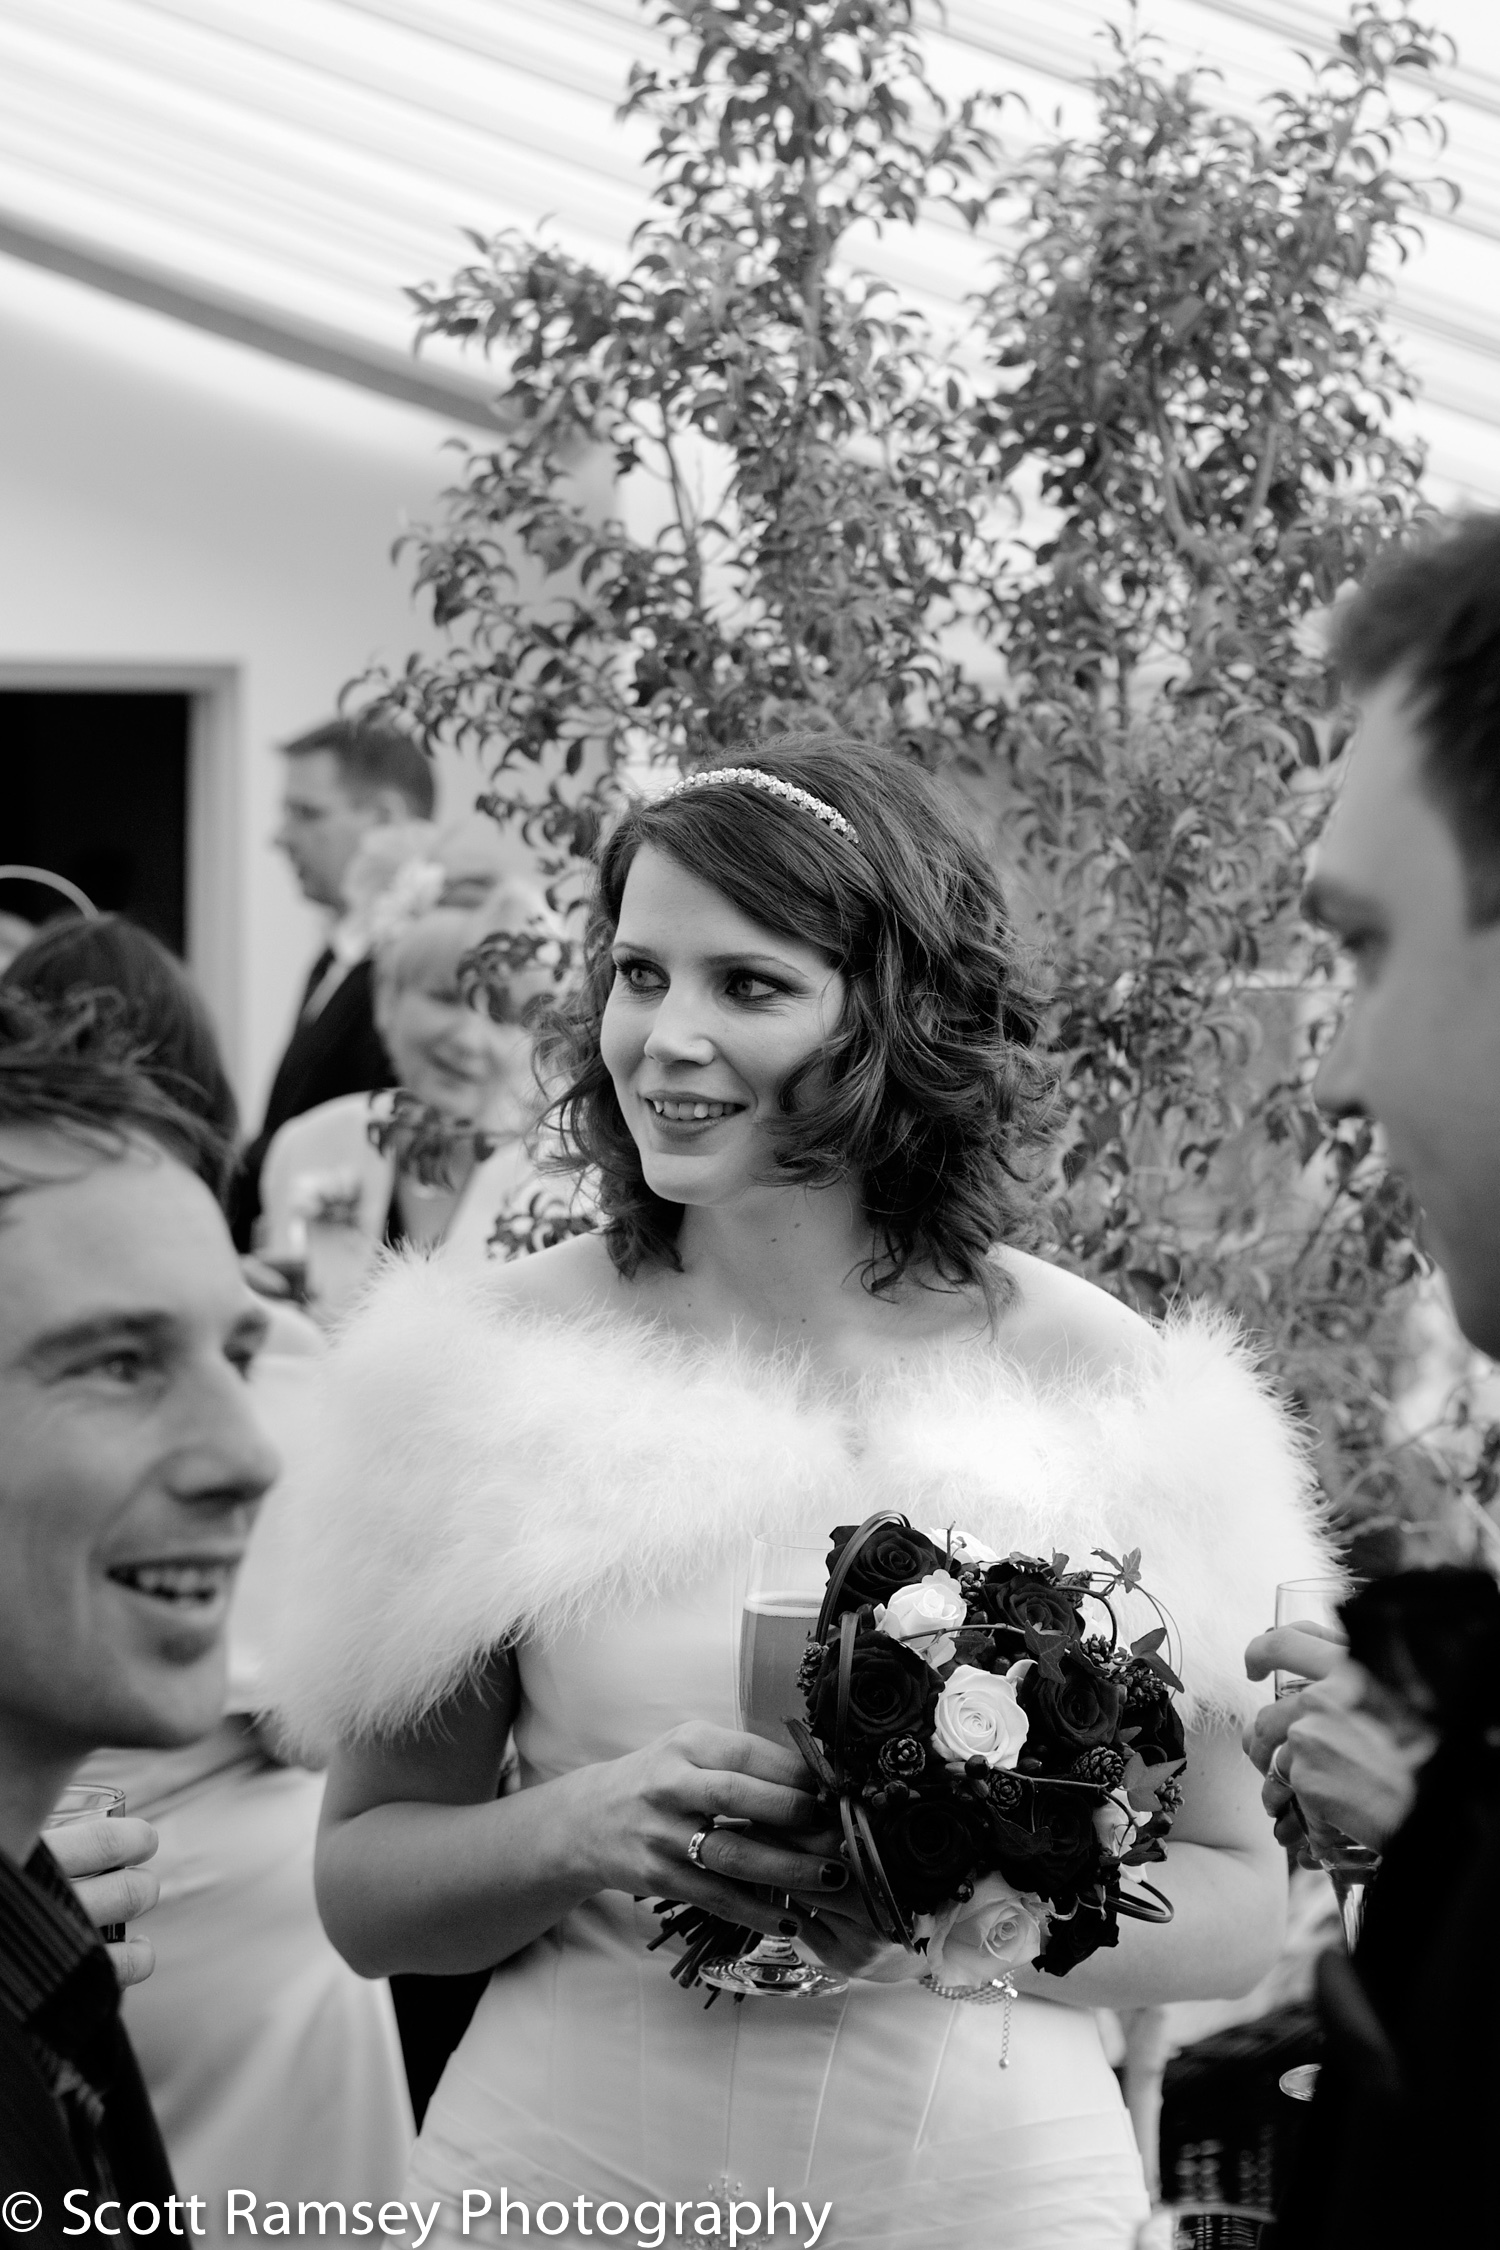 Winter-Wedding-Spread-Eagle-Hotel-Midhurst-Beautiful-Bride-03121